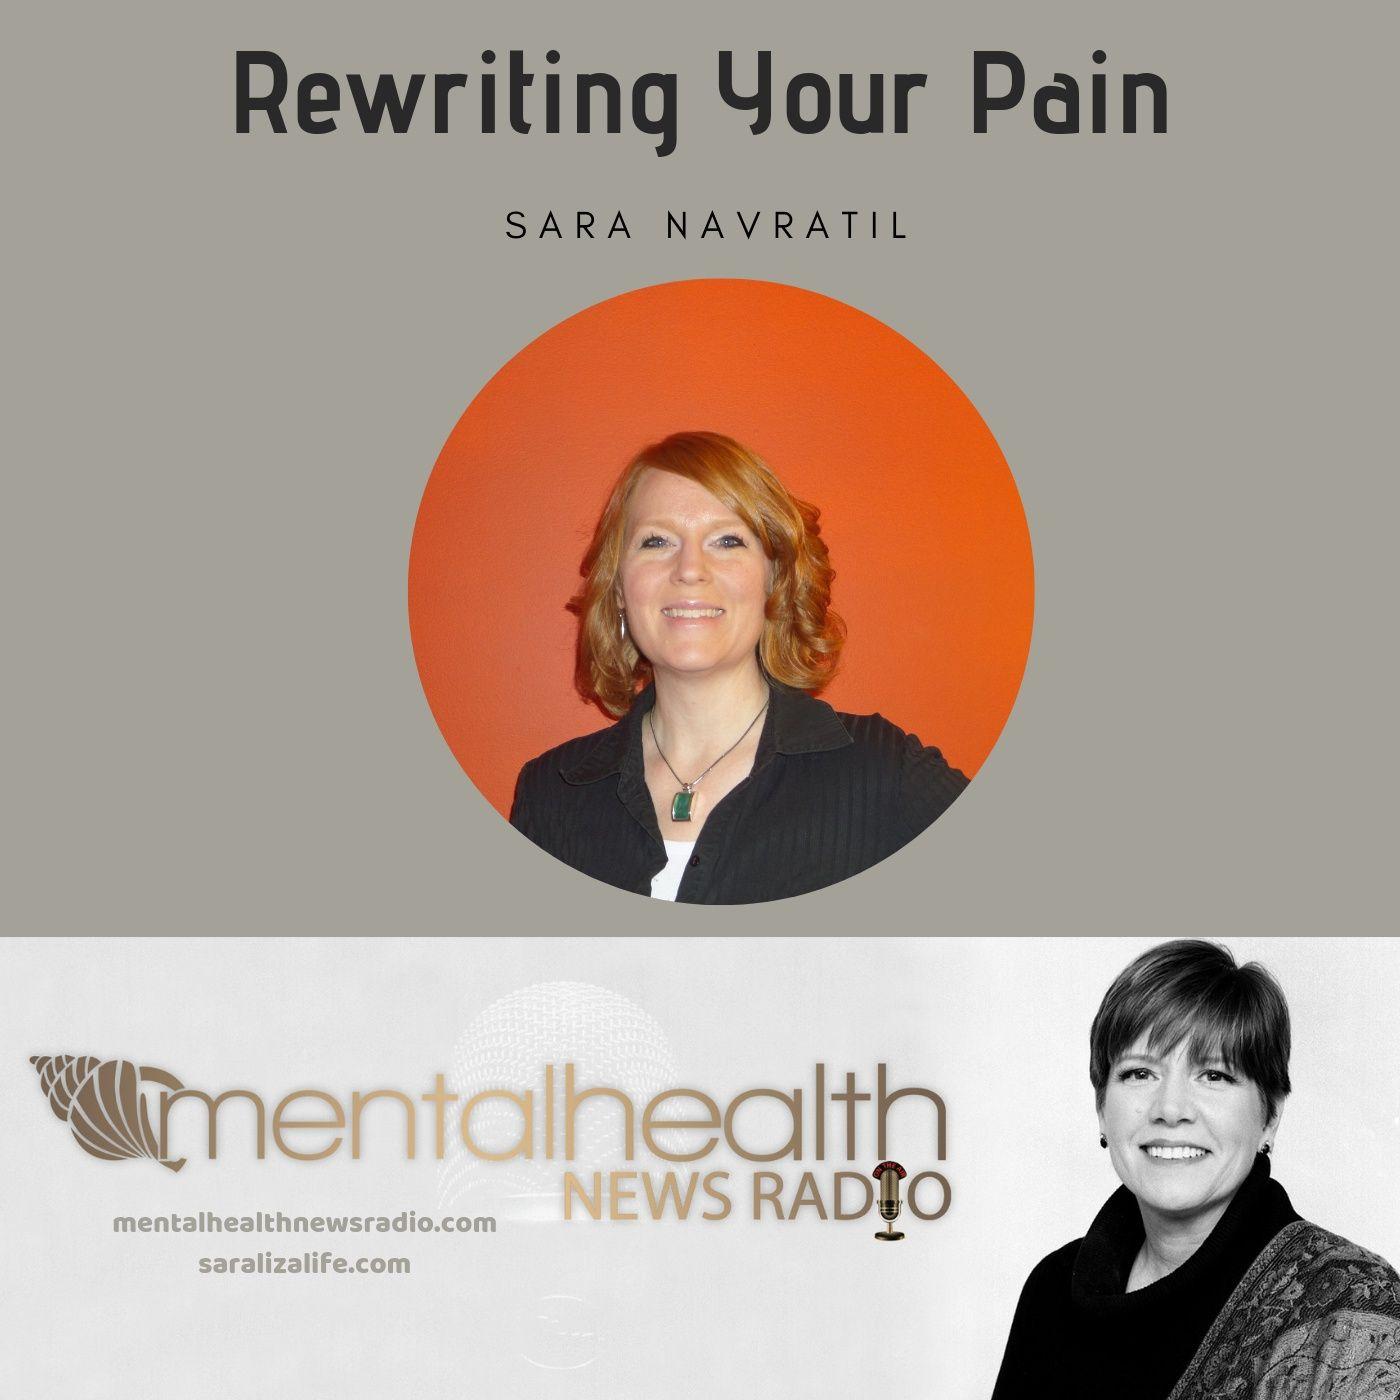 Mental Health News Radio - Rewriting Your Pain with Sara Navratil